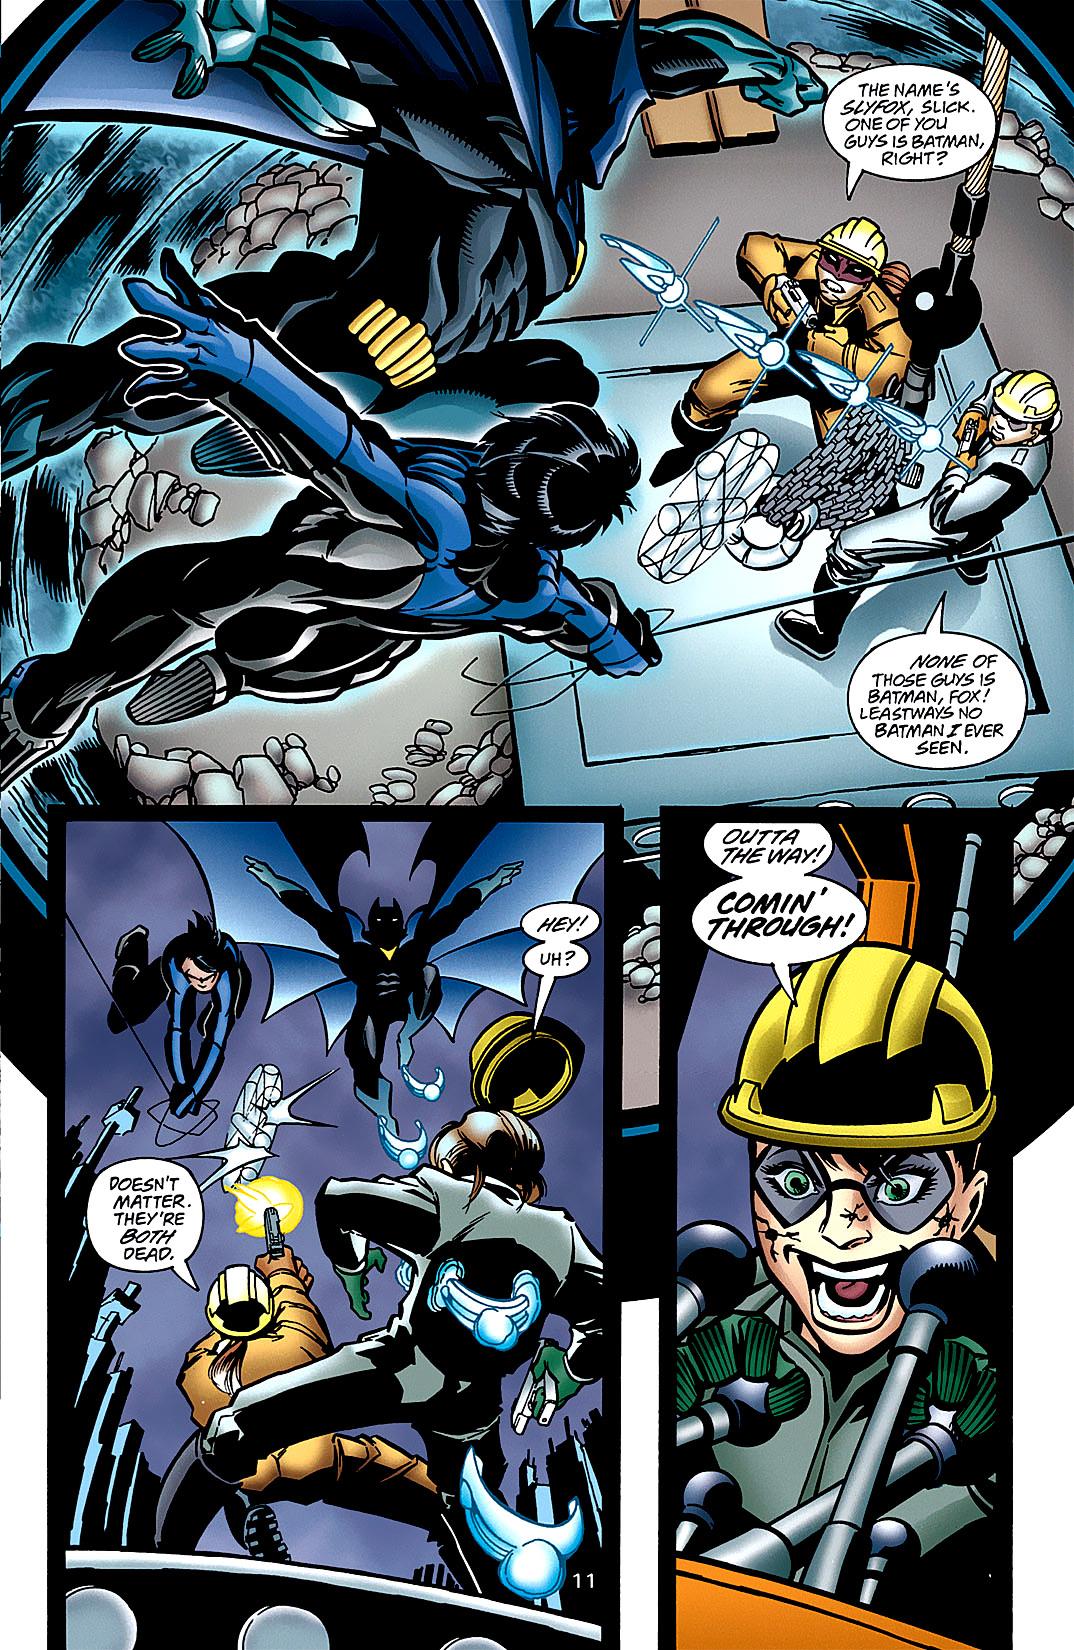 Nightwing (1996) chap 1000000 pic 12